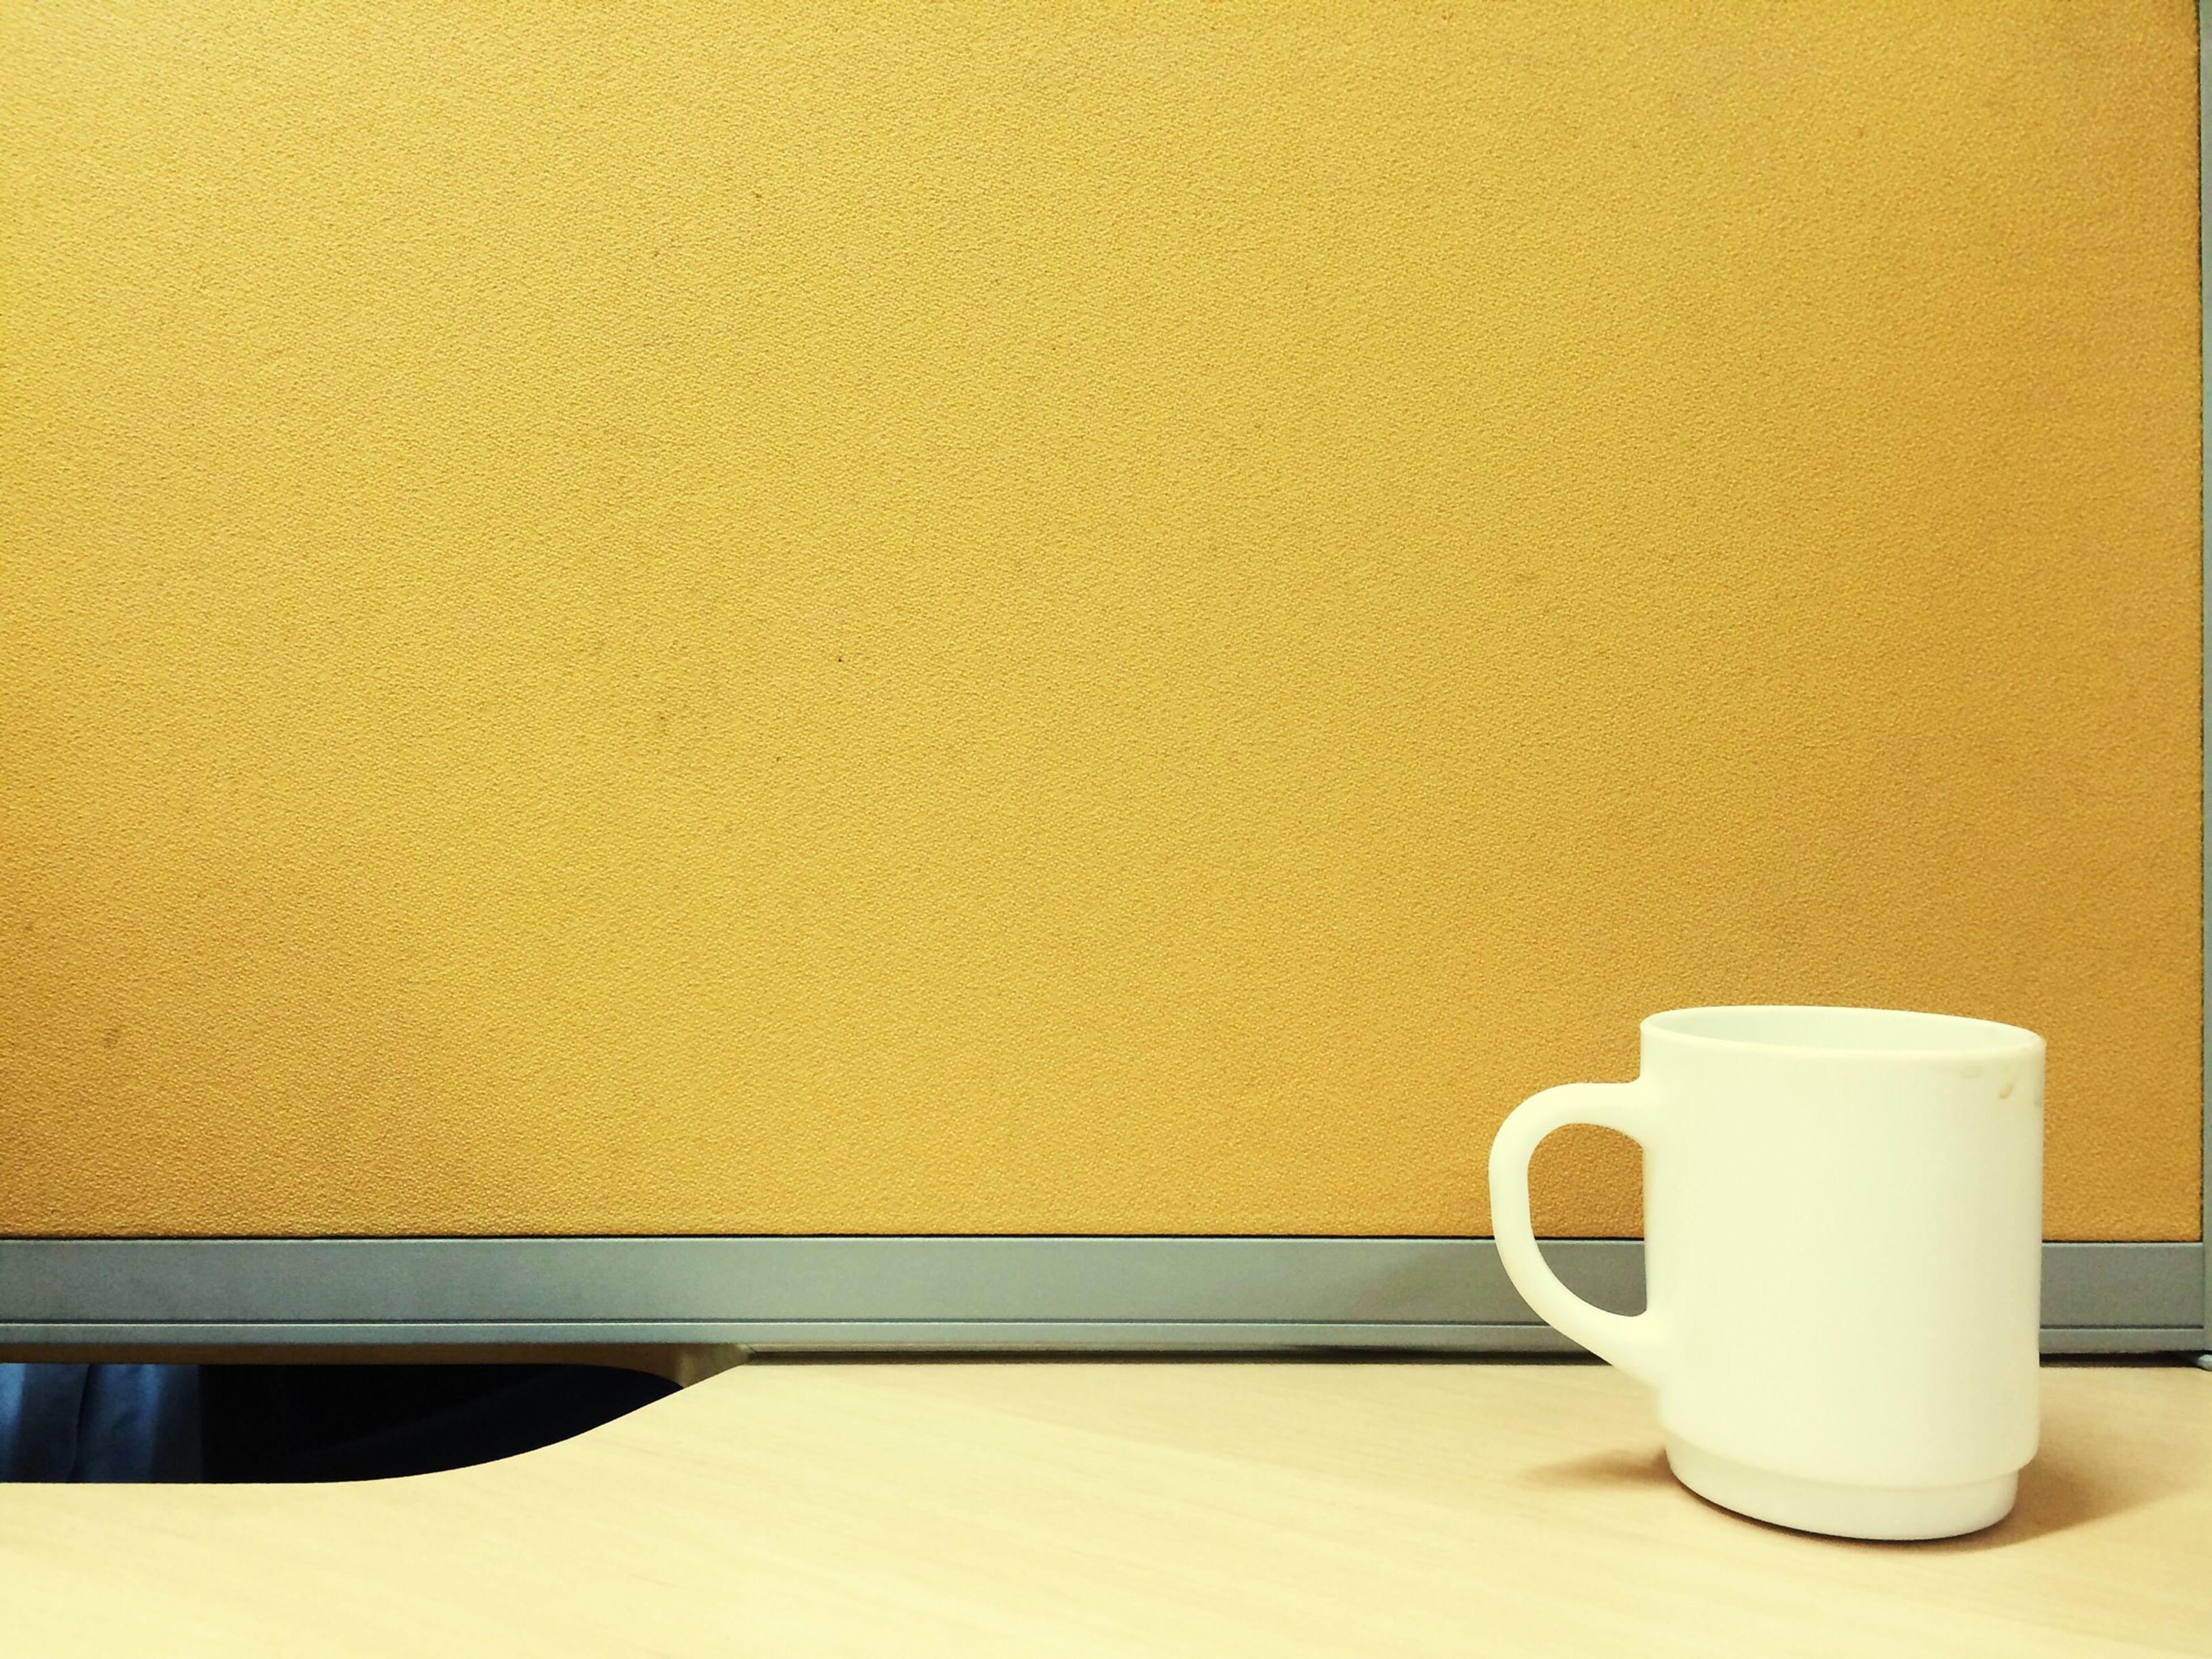 Working Coffee Break First Eyeem Photo